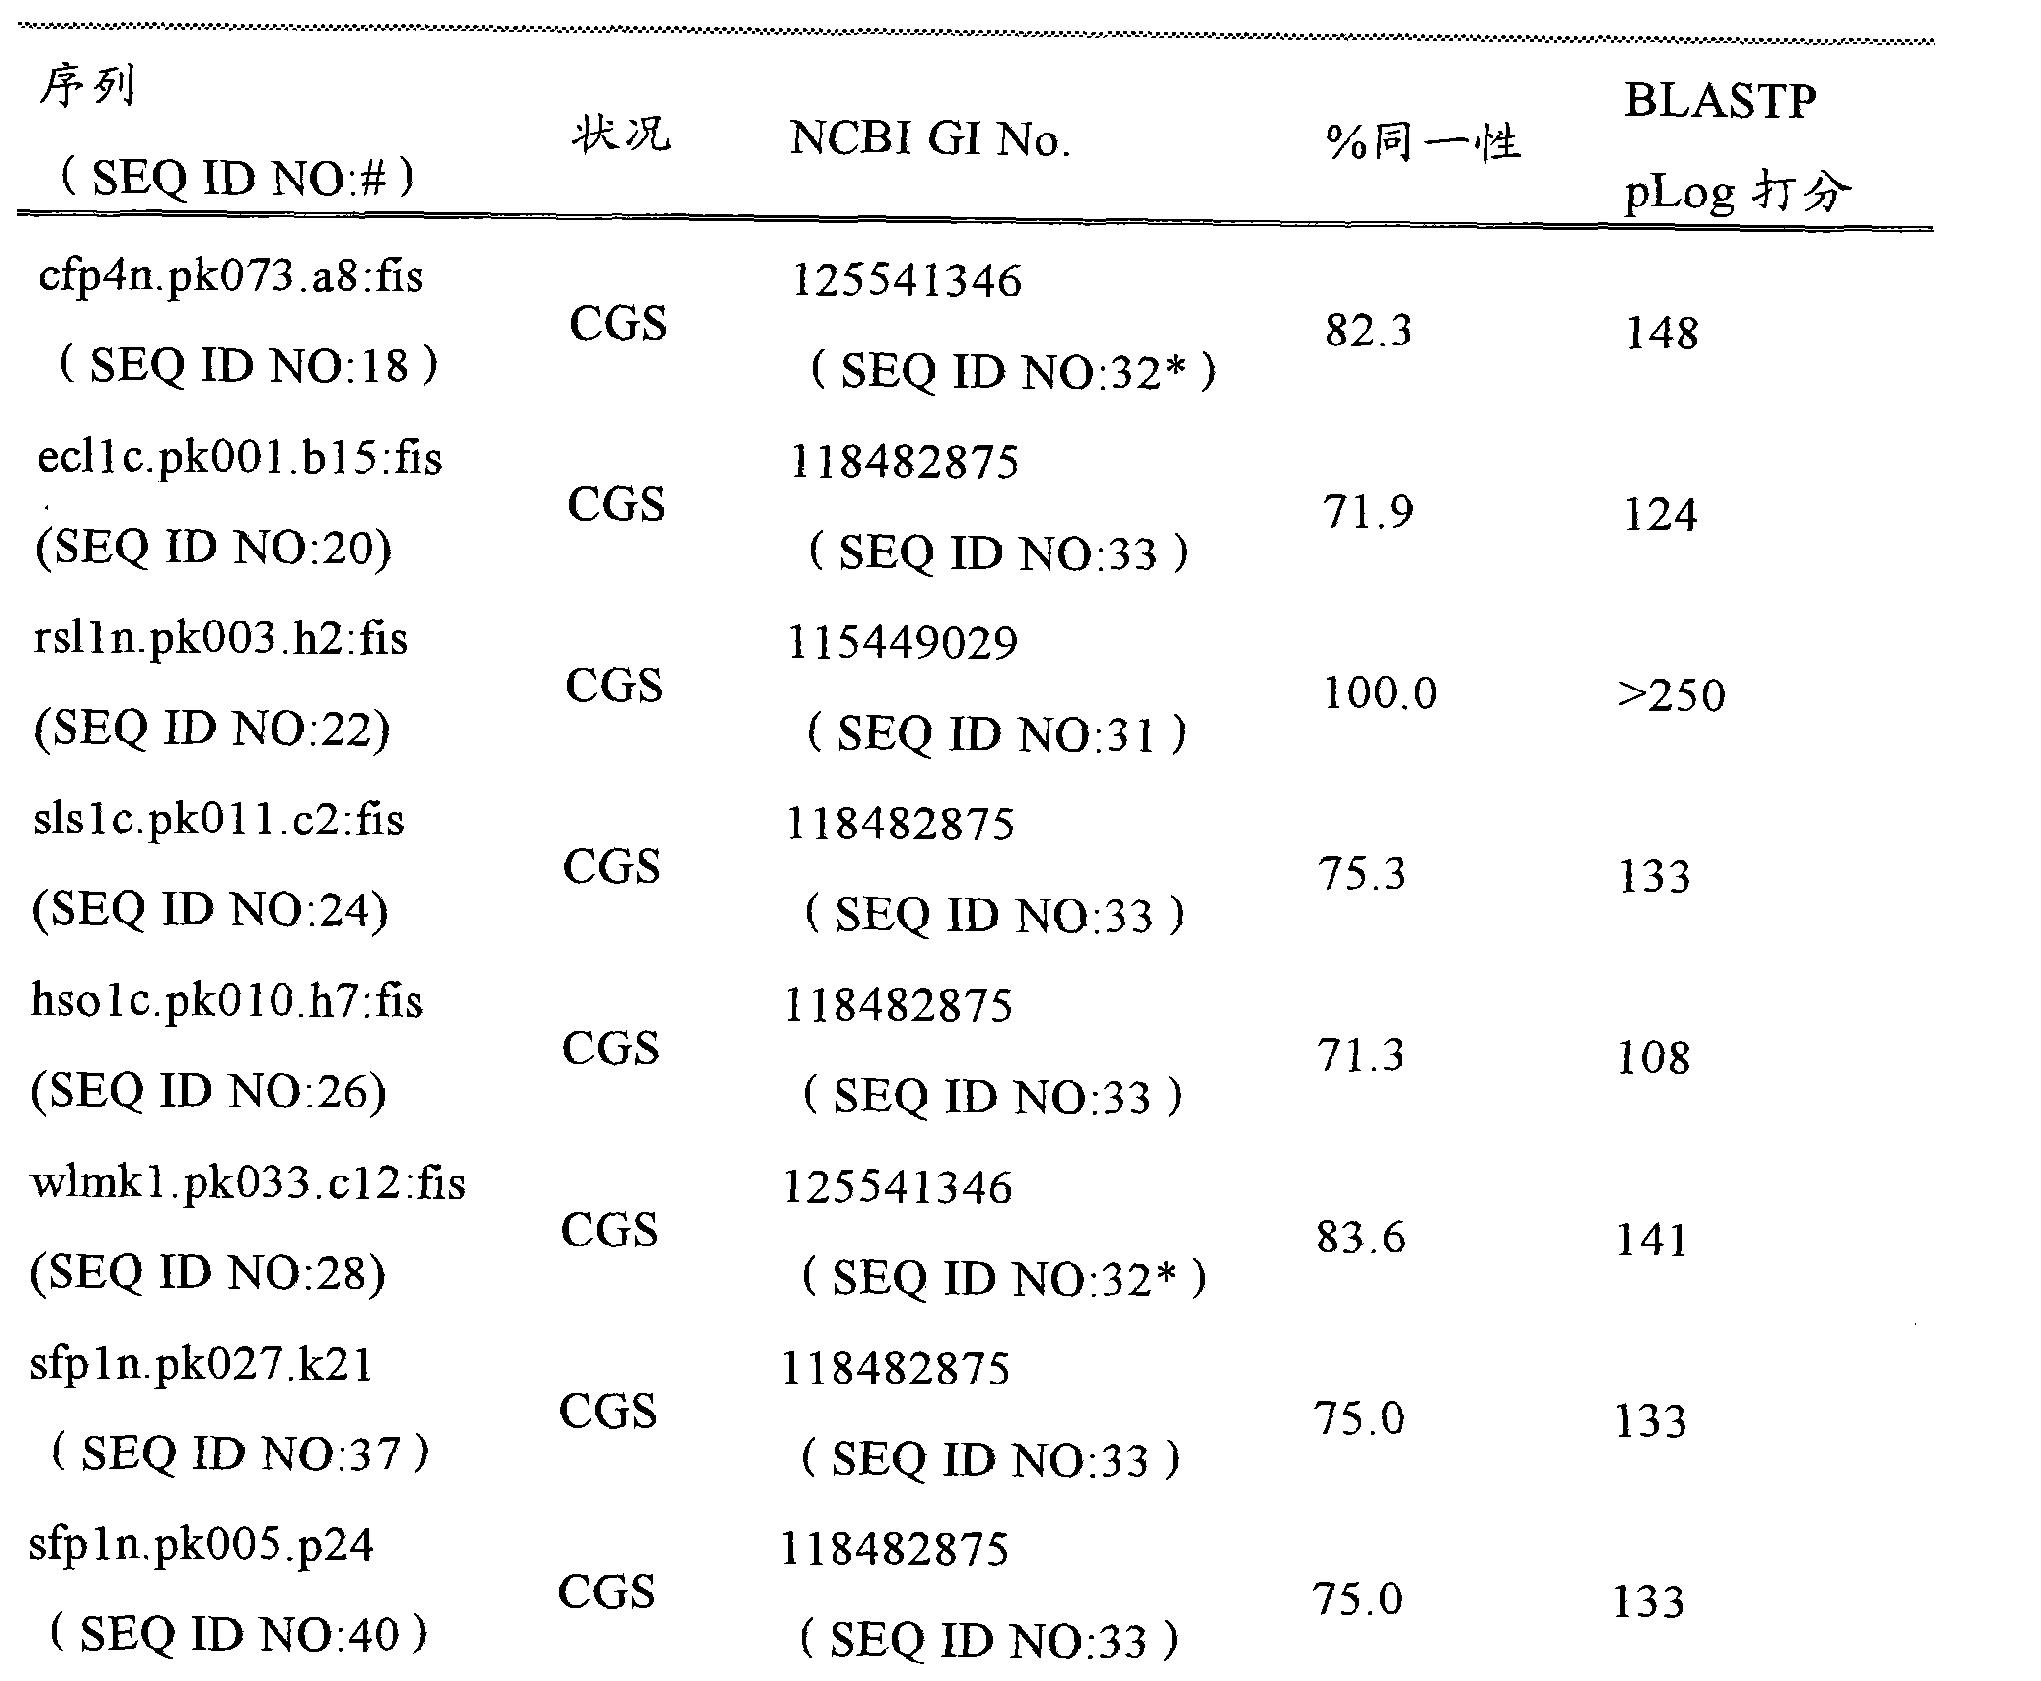 CN102203263A   Plants having altered agronomic characteristics